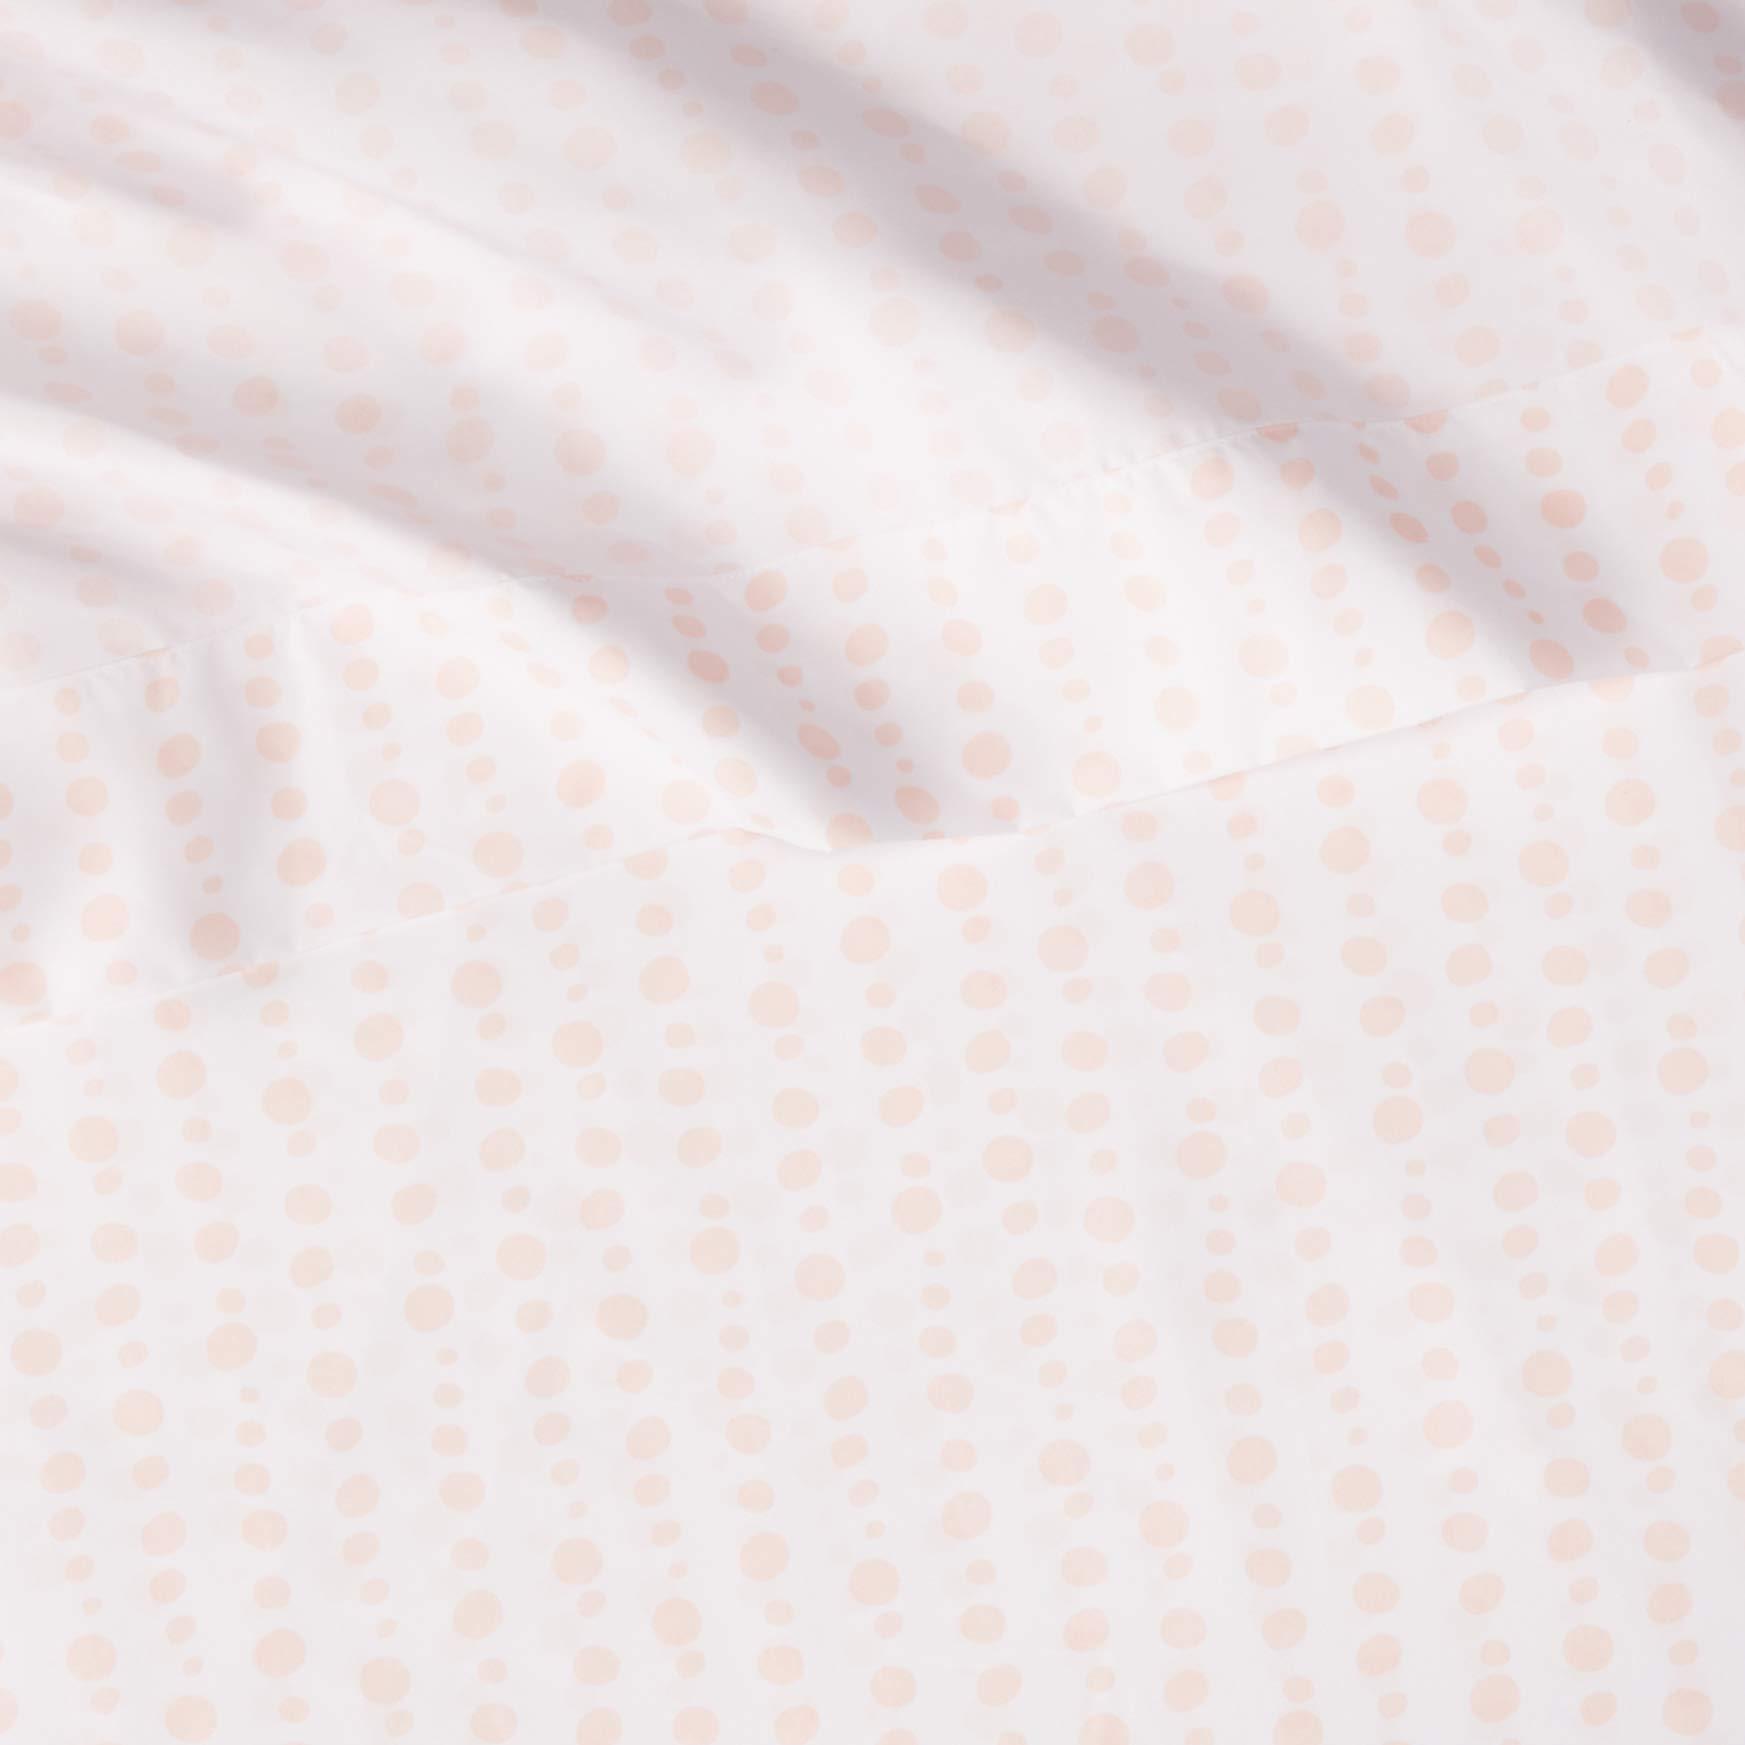 AmazonBasics Kid's Sheet Set - Soft, Easy-Wash Microfiber - Twin, Pink Dotted Stripes by AmazonBasics (Image #5)